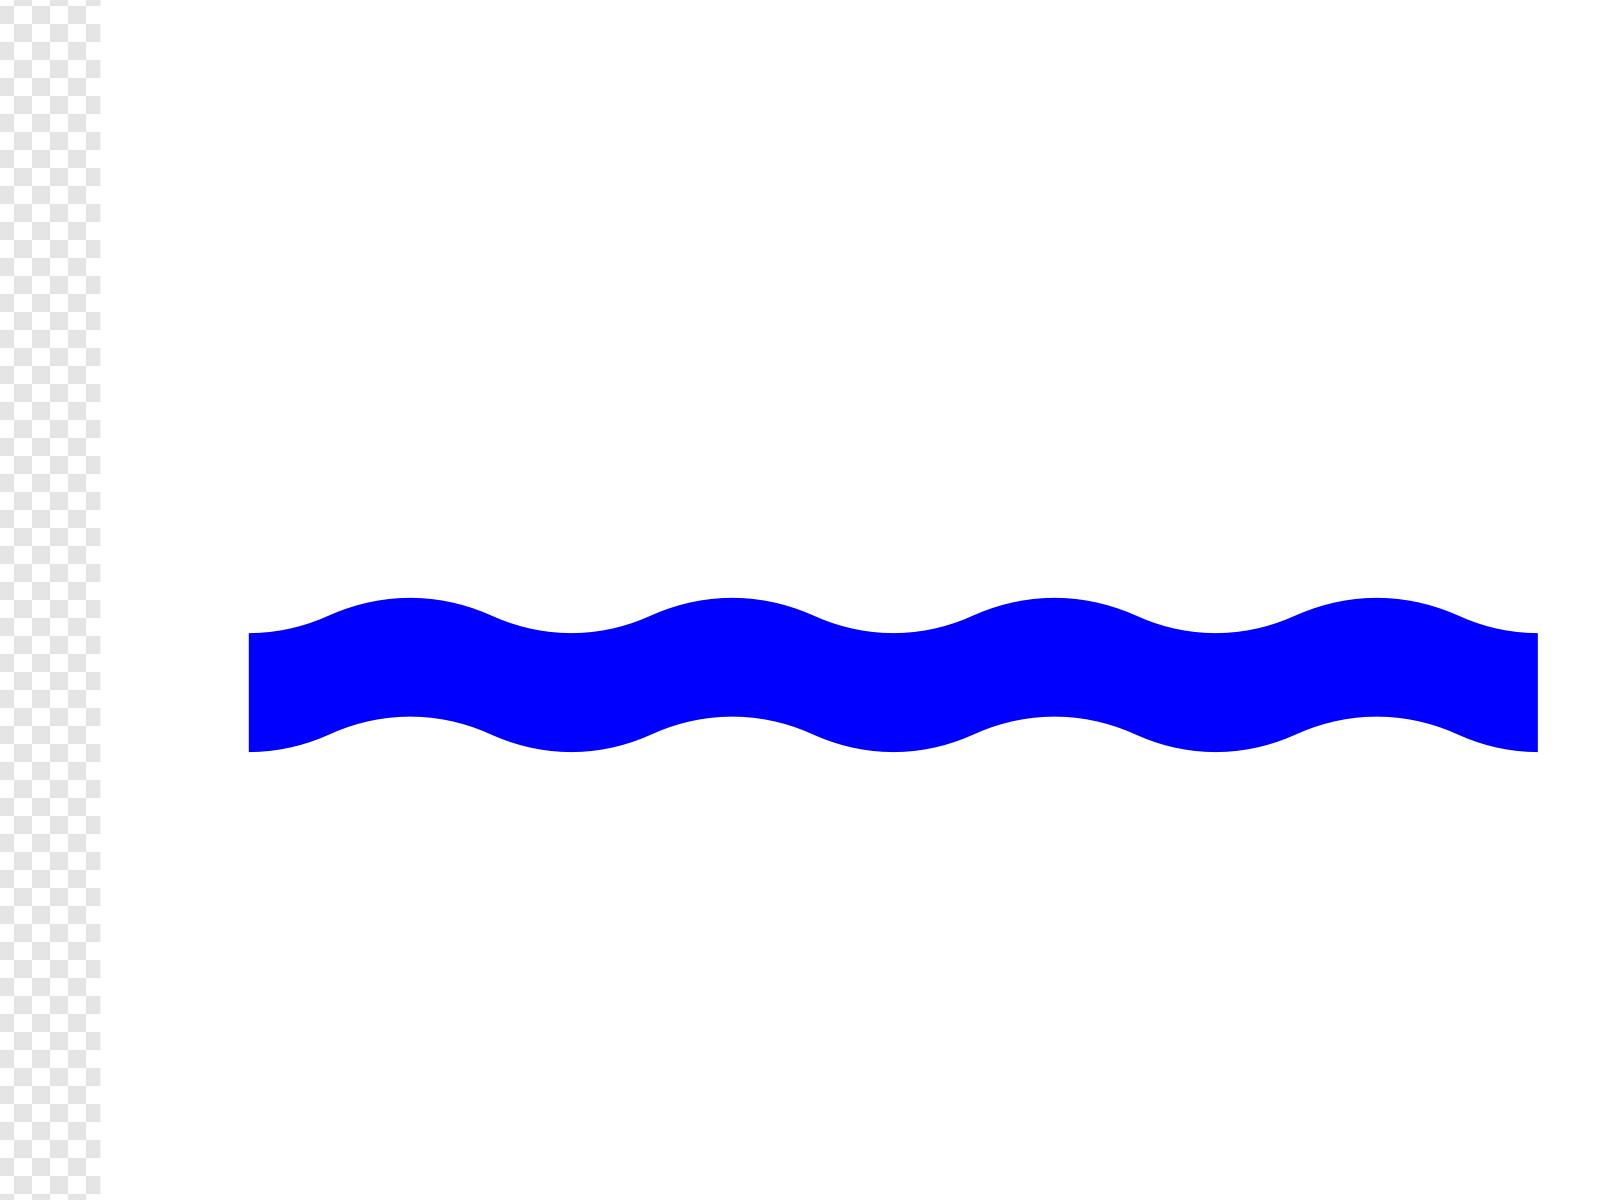 Waves clipart waterline, Waves waterline Transparent FREE.